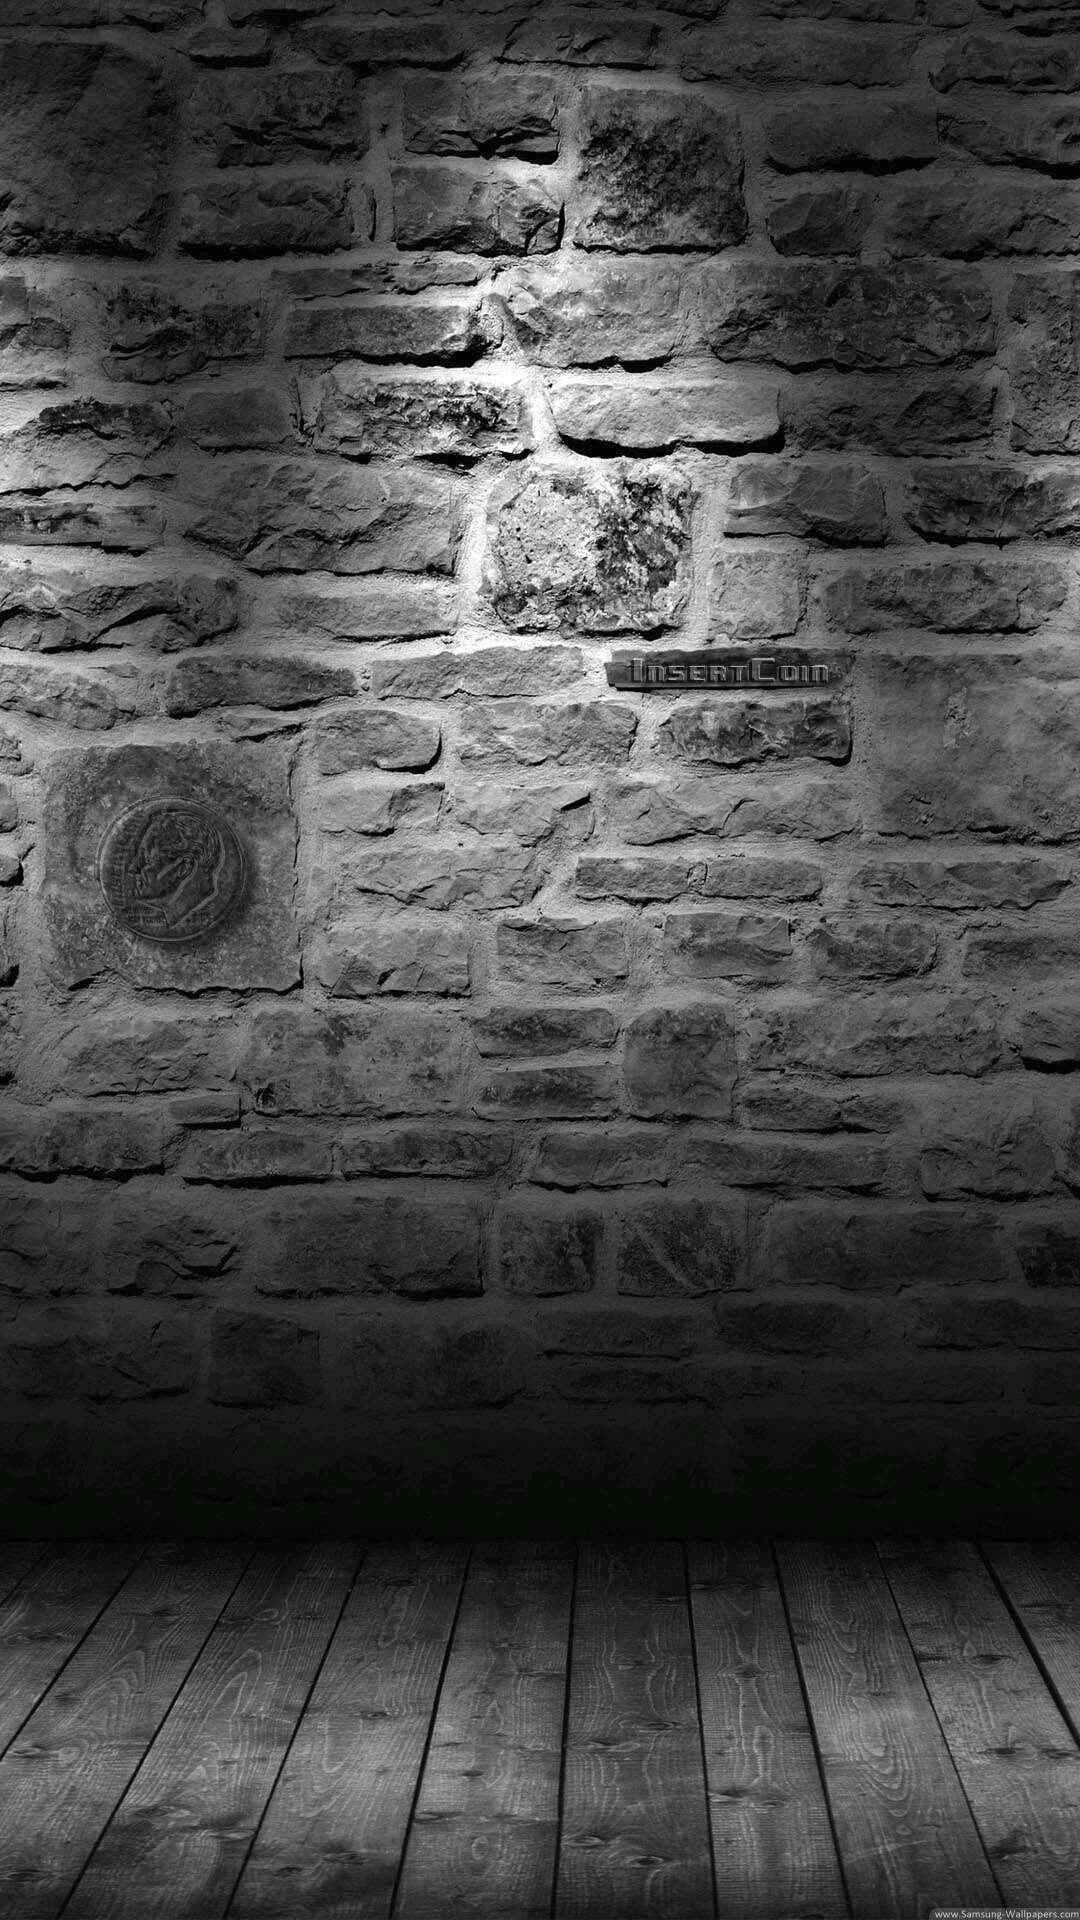 Dark Series Updated Full Hd Black Lock Screen Wallpapers Download Now Flyme Official Forum